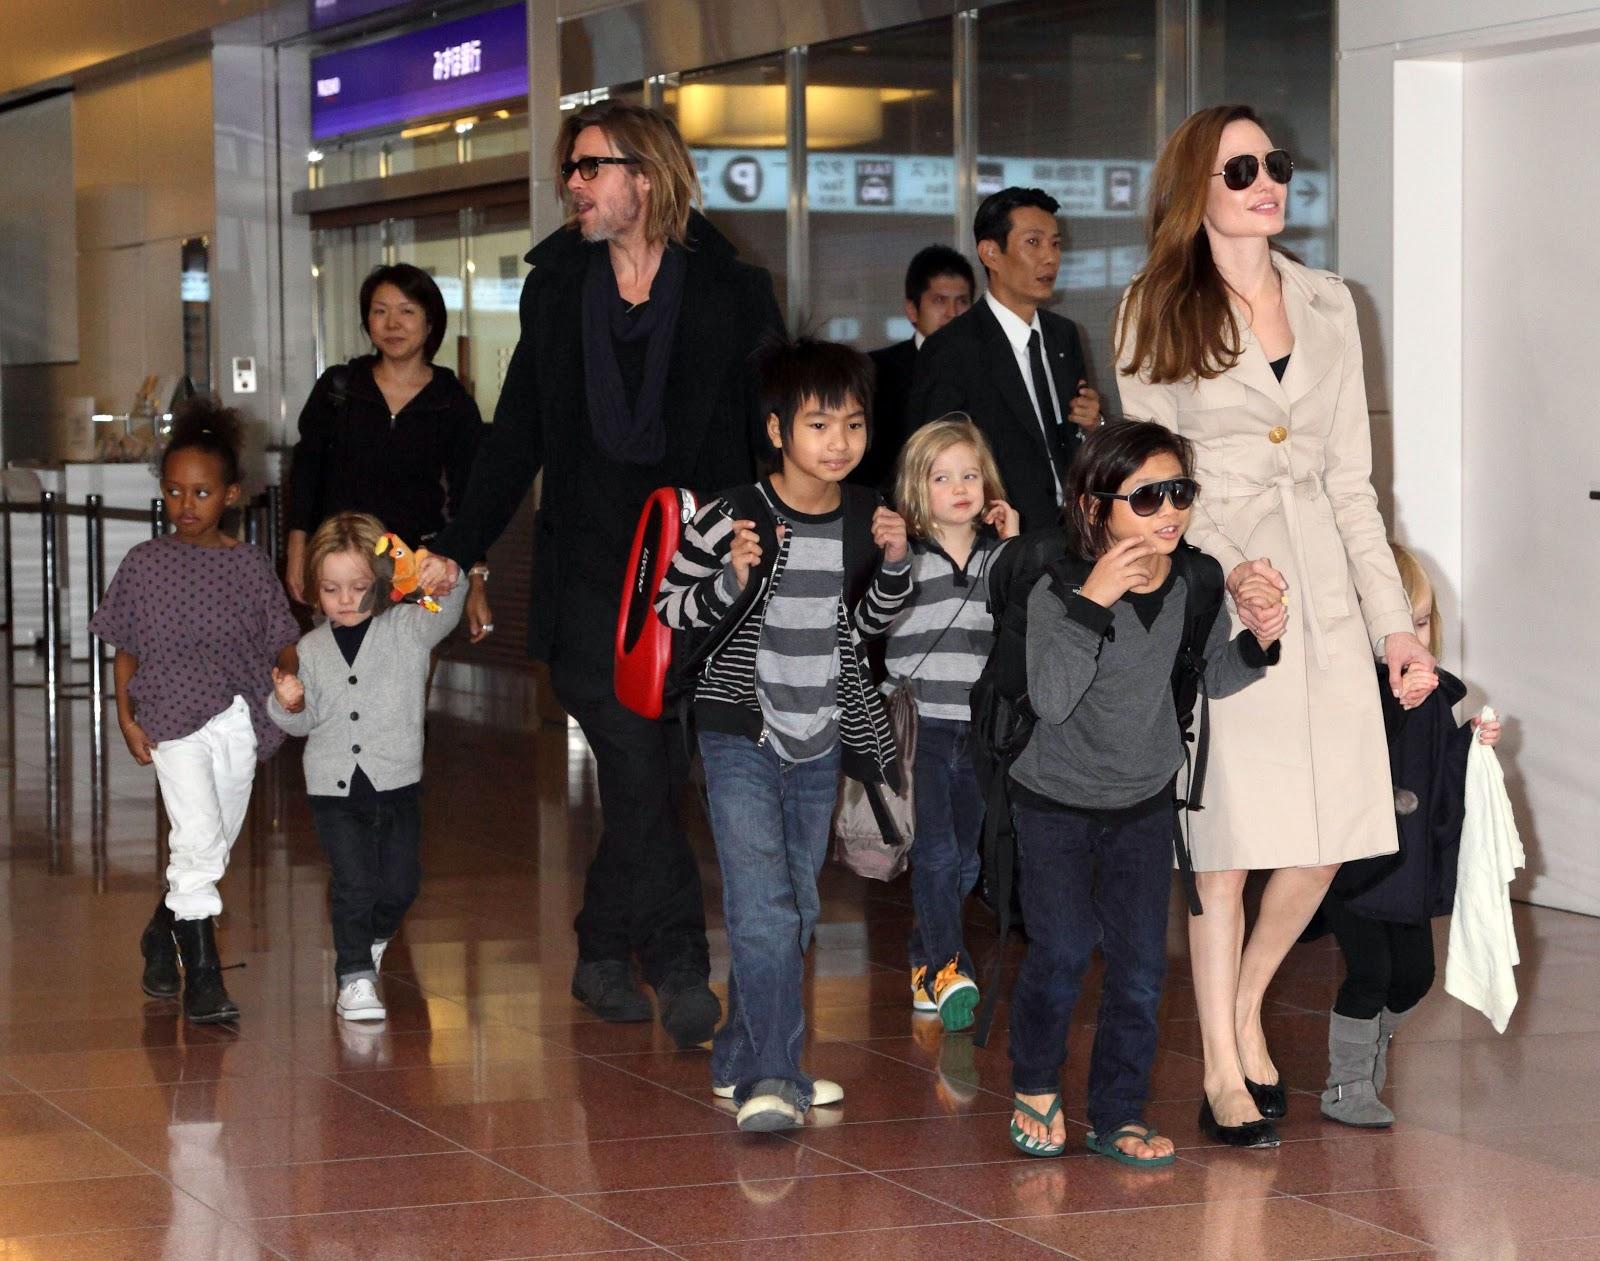 http://2.bp.blogspot.com/-nYD0RWlovds/UQI4wFaRbWI/AAAAAAAAALE/EyZ7FK7hORk/s1600/Brad-Pitt-Angelina-Jolie-and-family.jpg